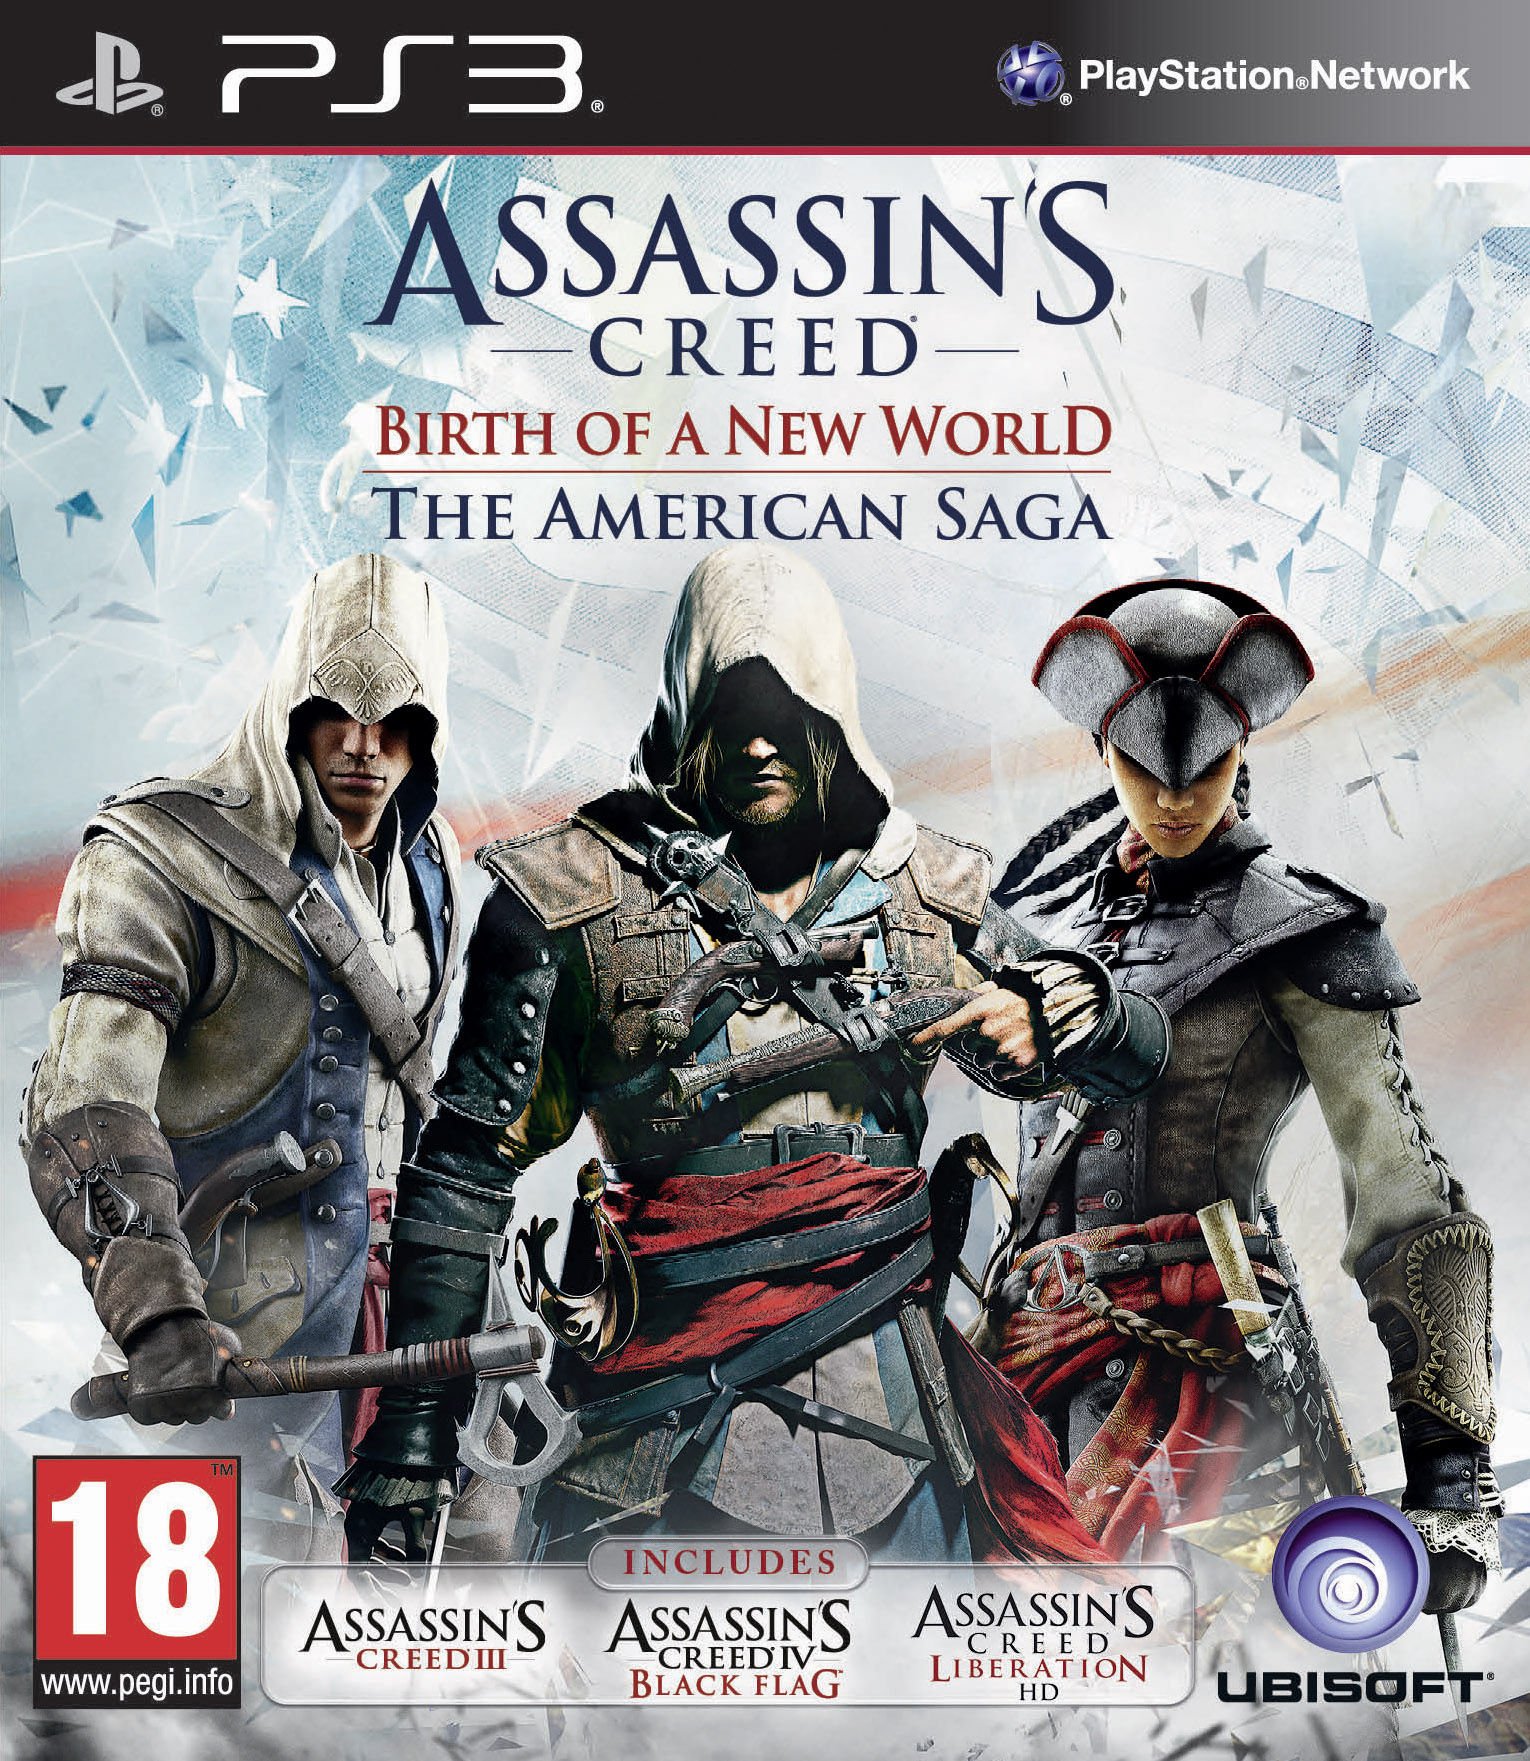 The Assassin's Creed Mega-Thread Aps3